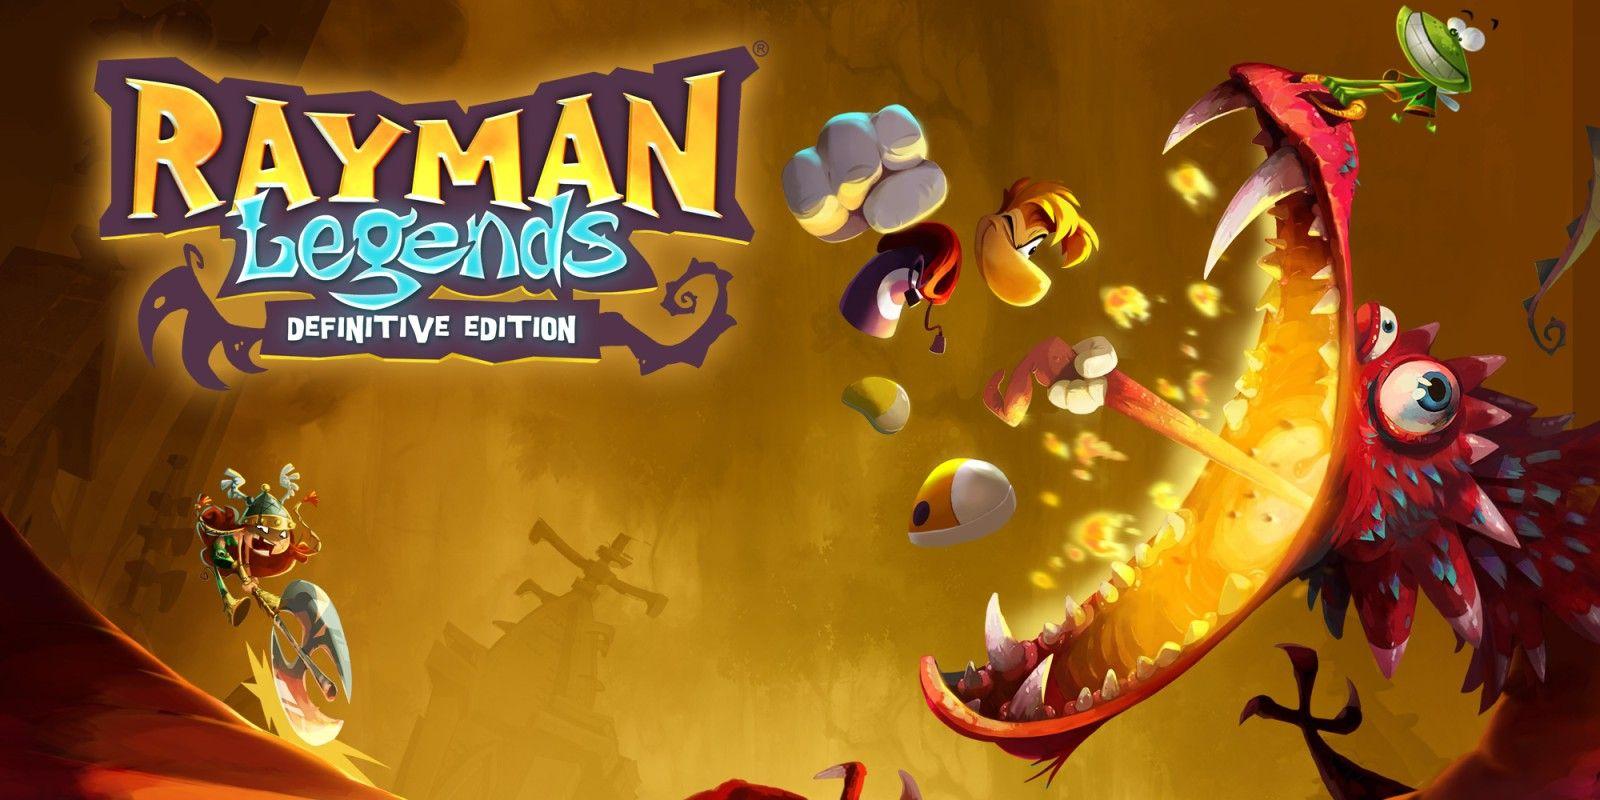 Rayman Legends: Definitive Edition (Digital) Nintendo Switch £14.99 @ Nintendo eshop